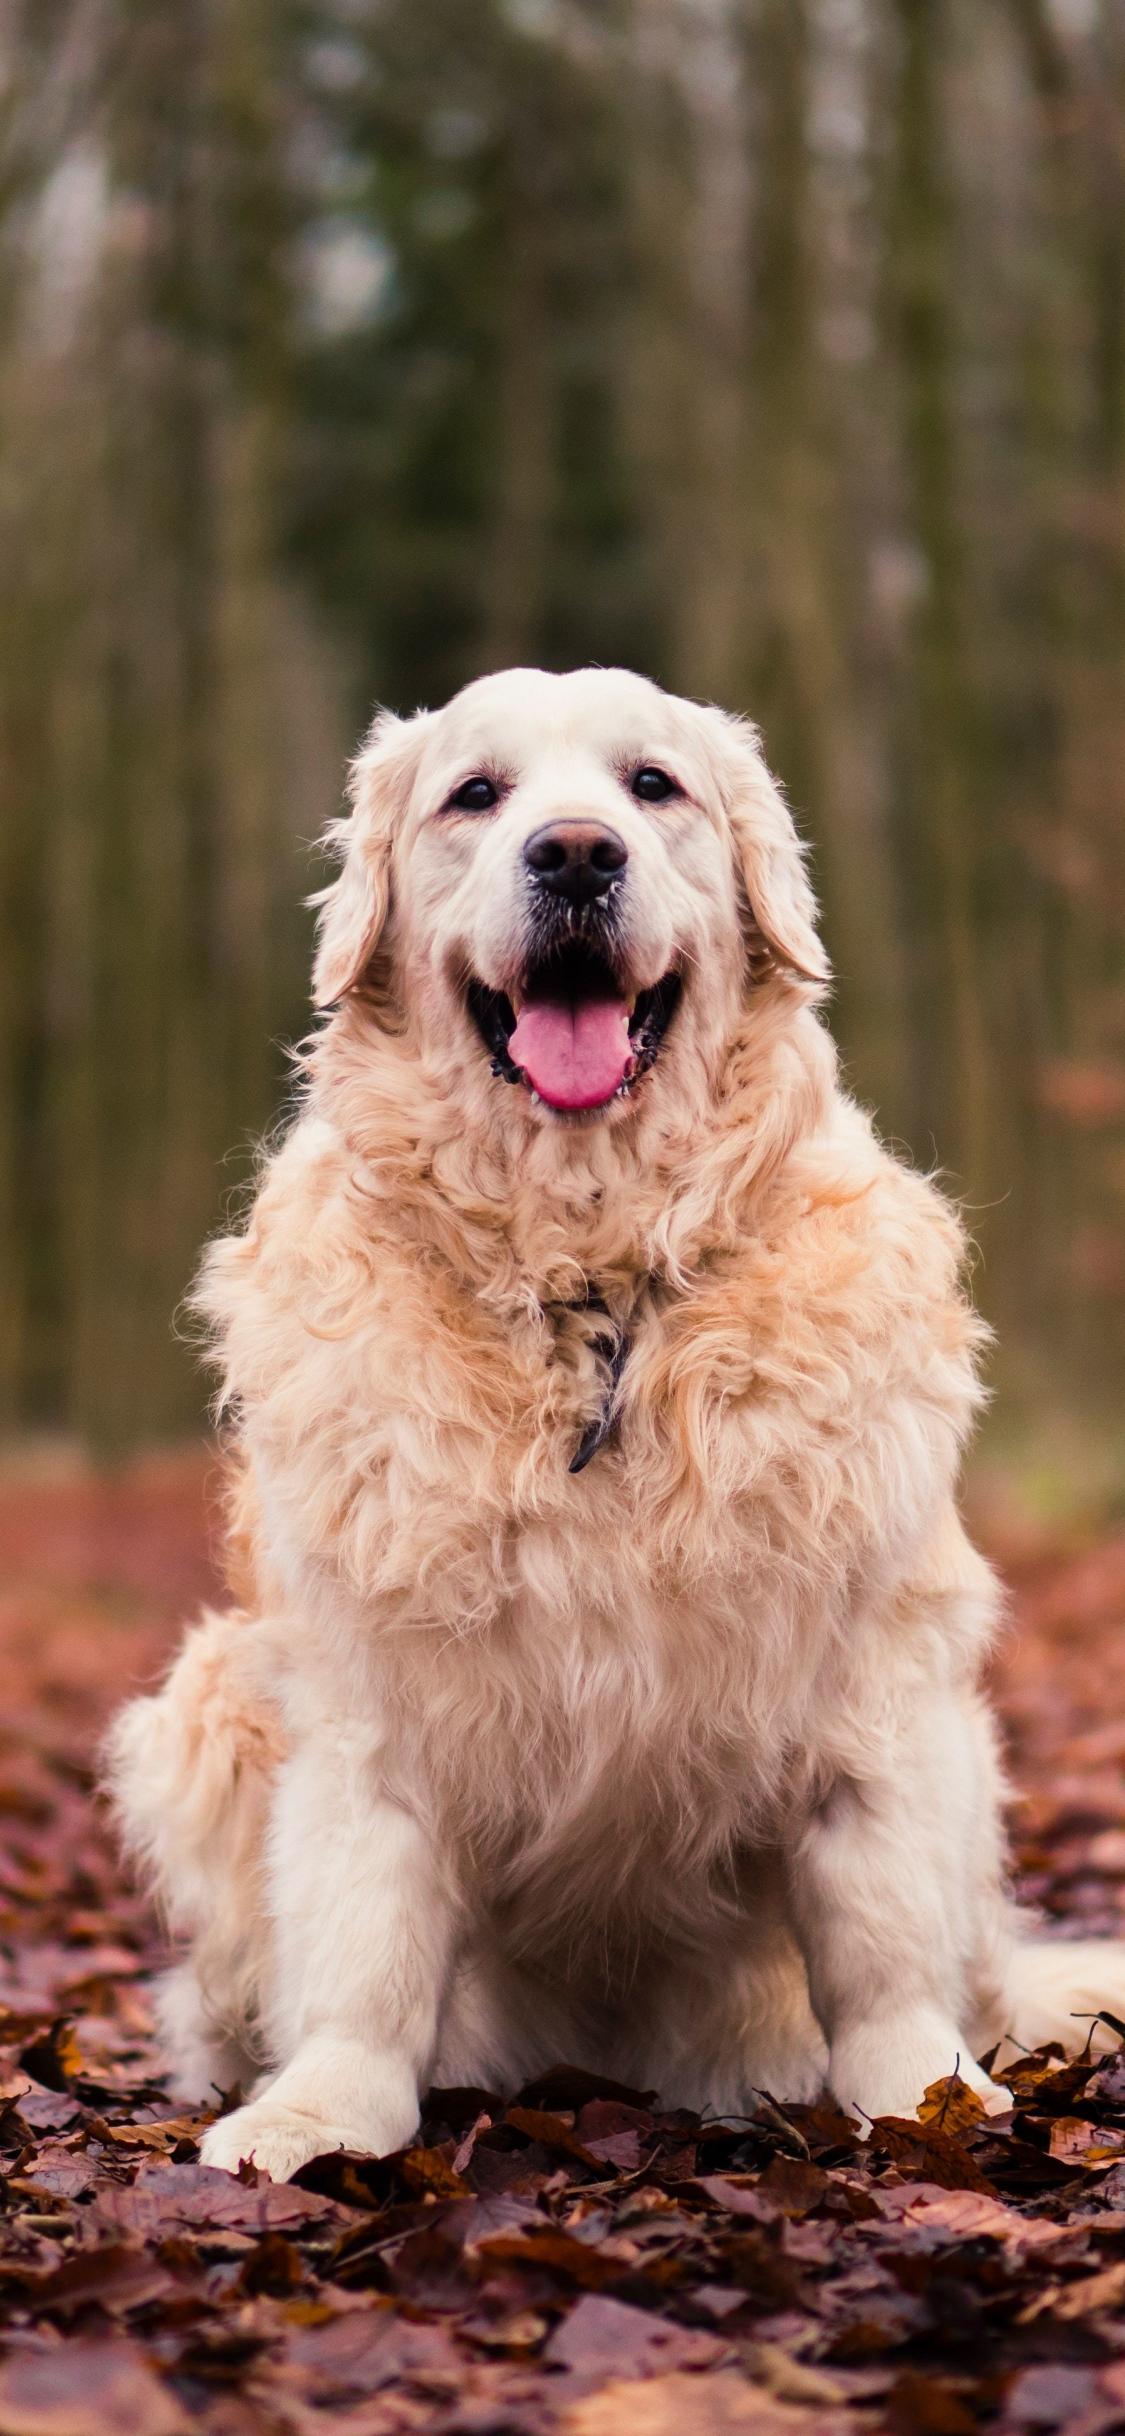 Golden Retriever Dog Wallpaper For Laptop 3129413 Hd Wallpaper Backgrounds Download